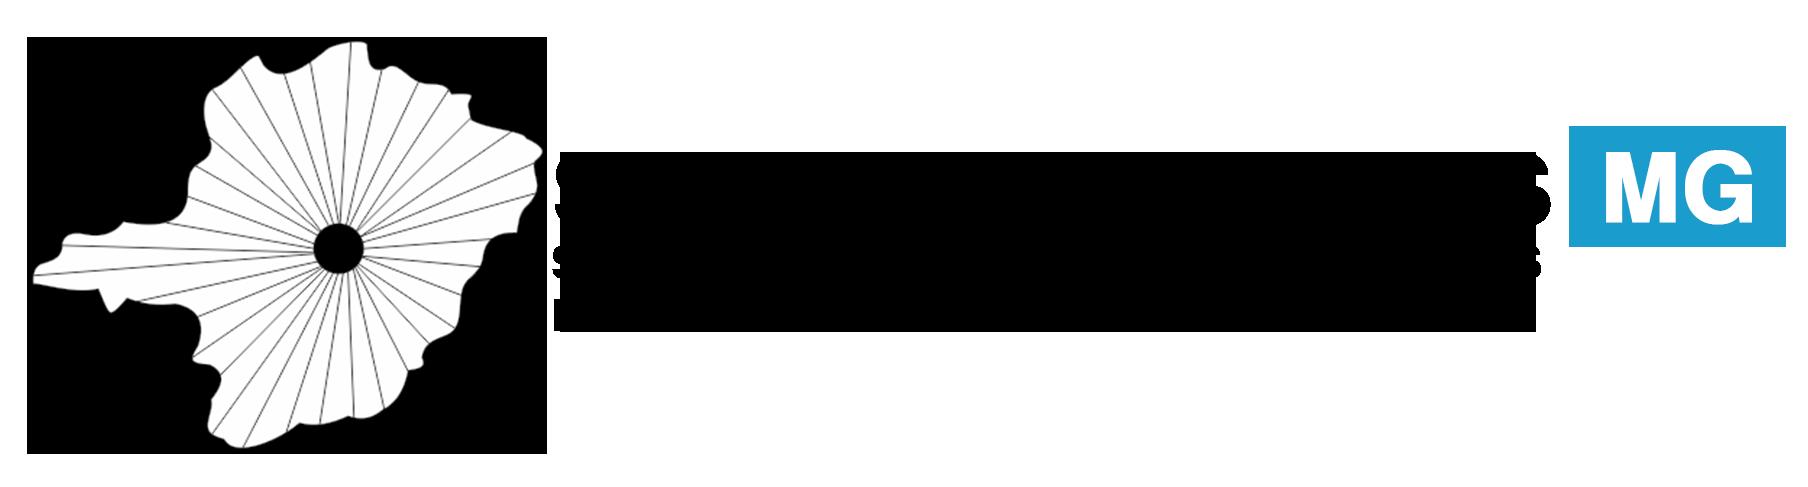 Sindilivre Idiomas MG